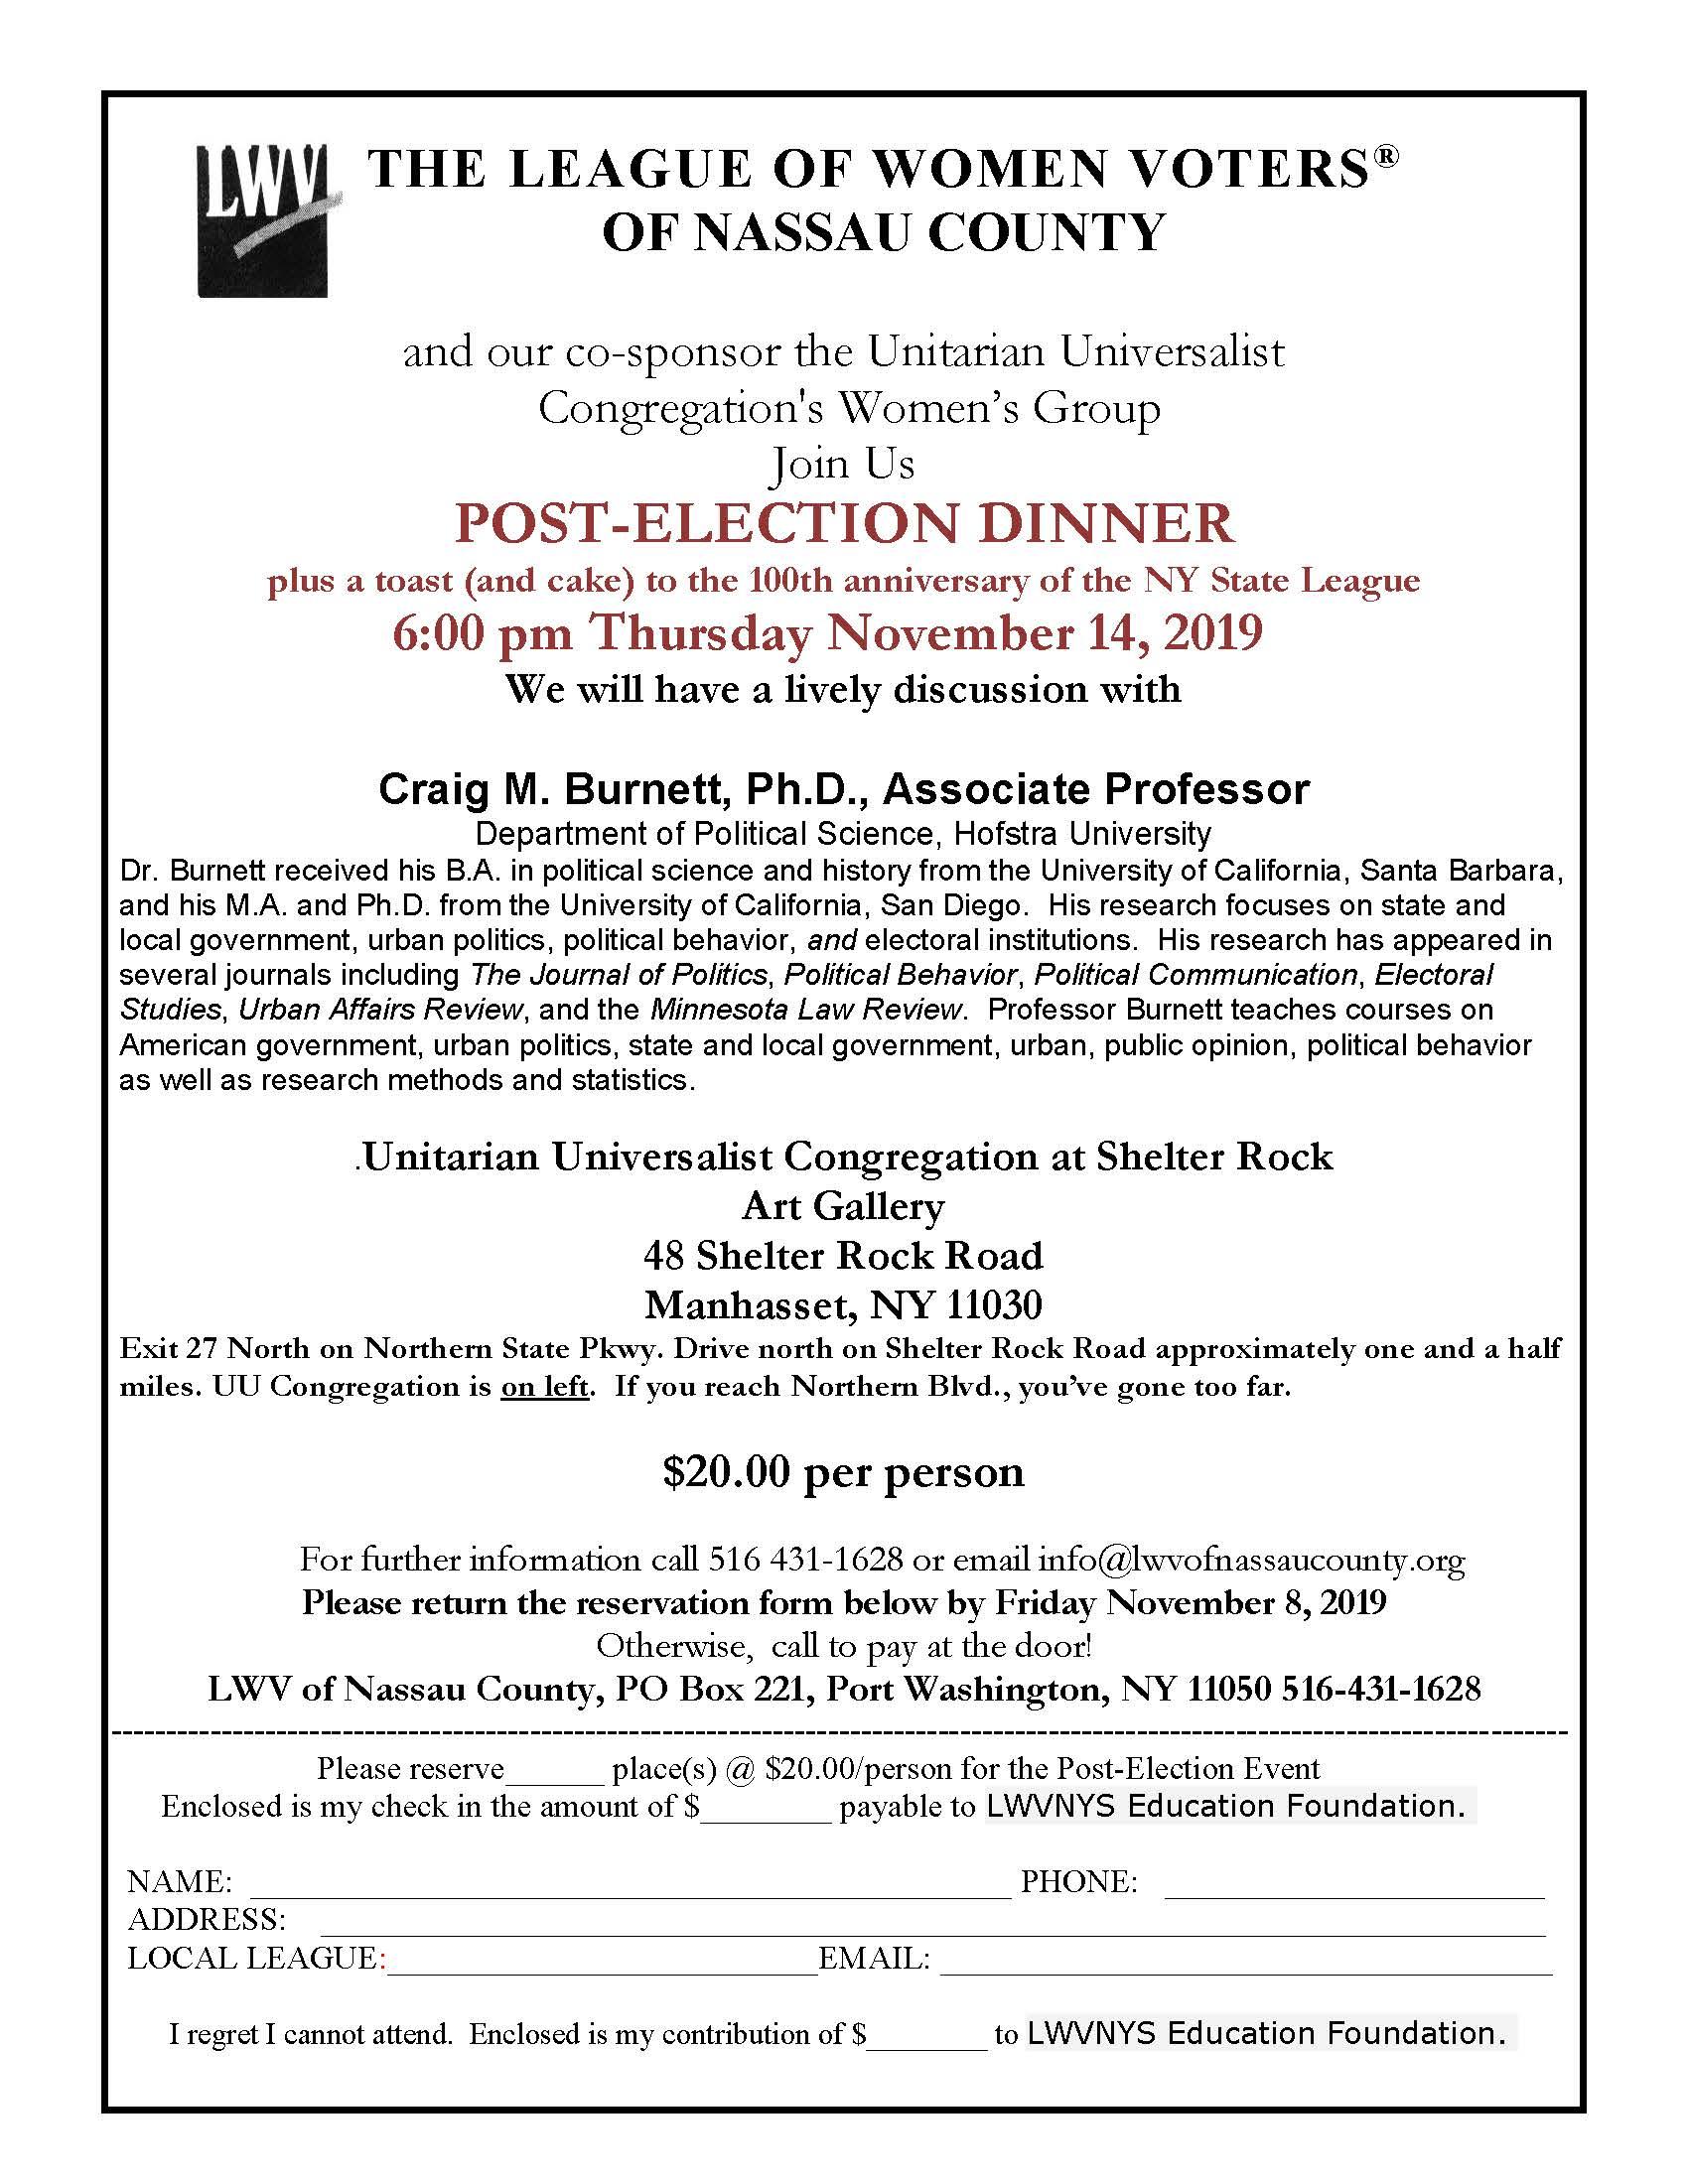 lwvnc Post Election Supper Flyer 2019 111419